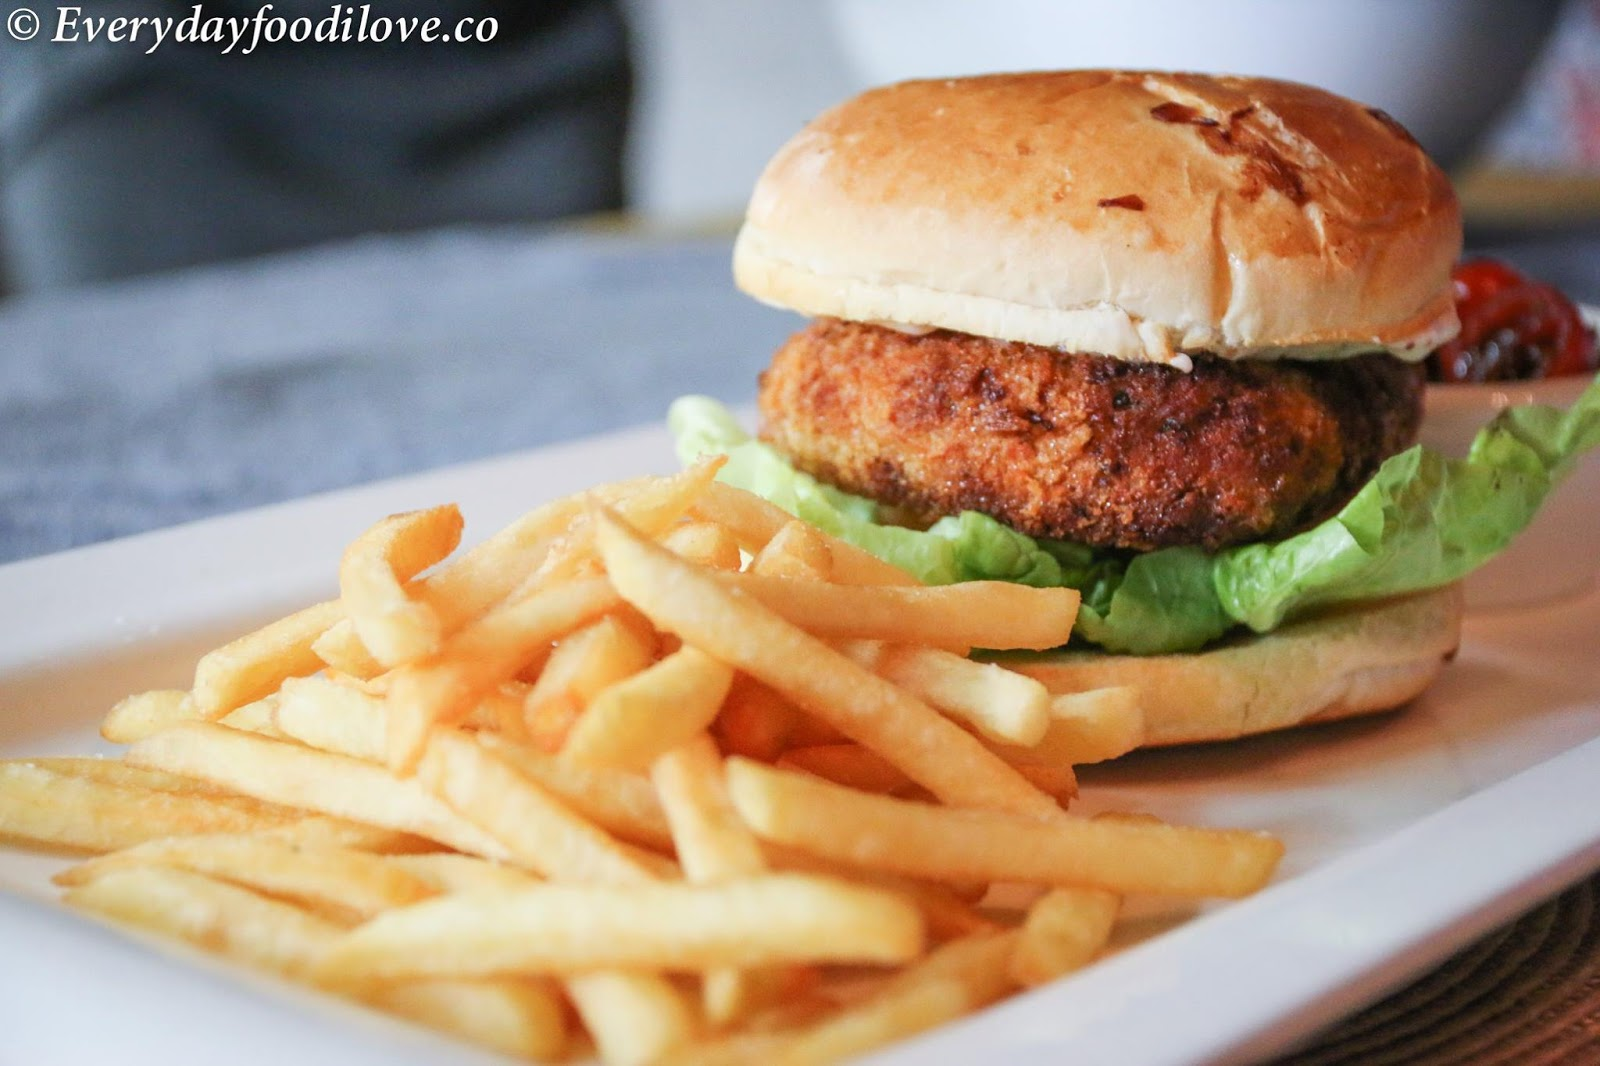 WIP @ Bangsar Shopping Centre | Everyday Food I Love